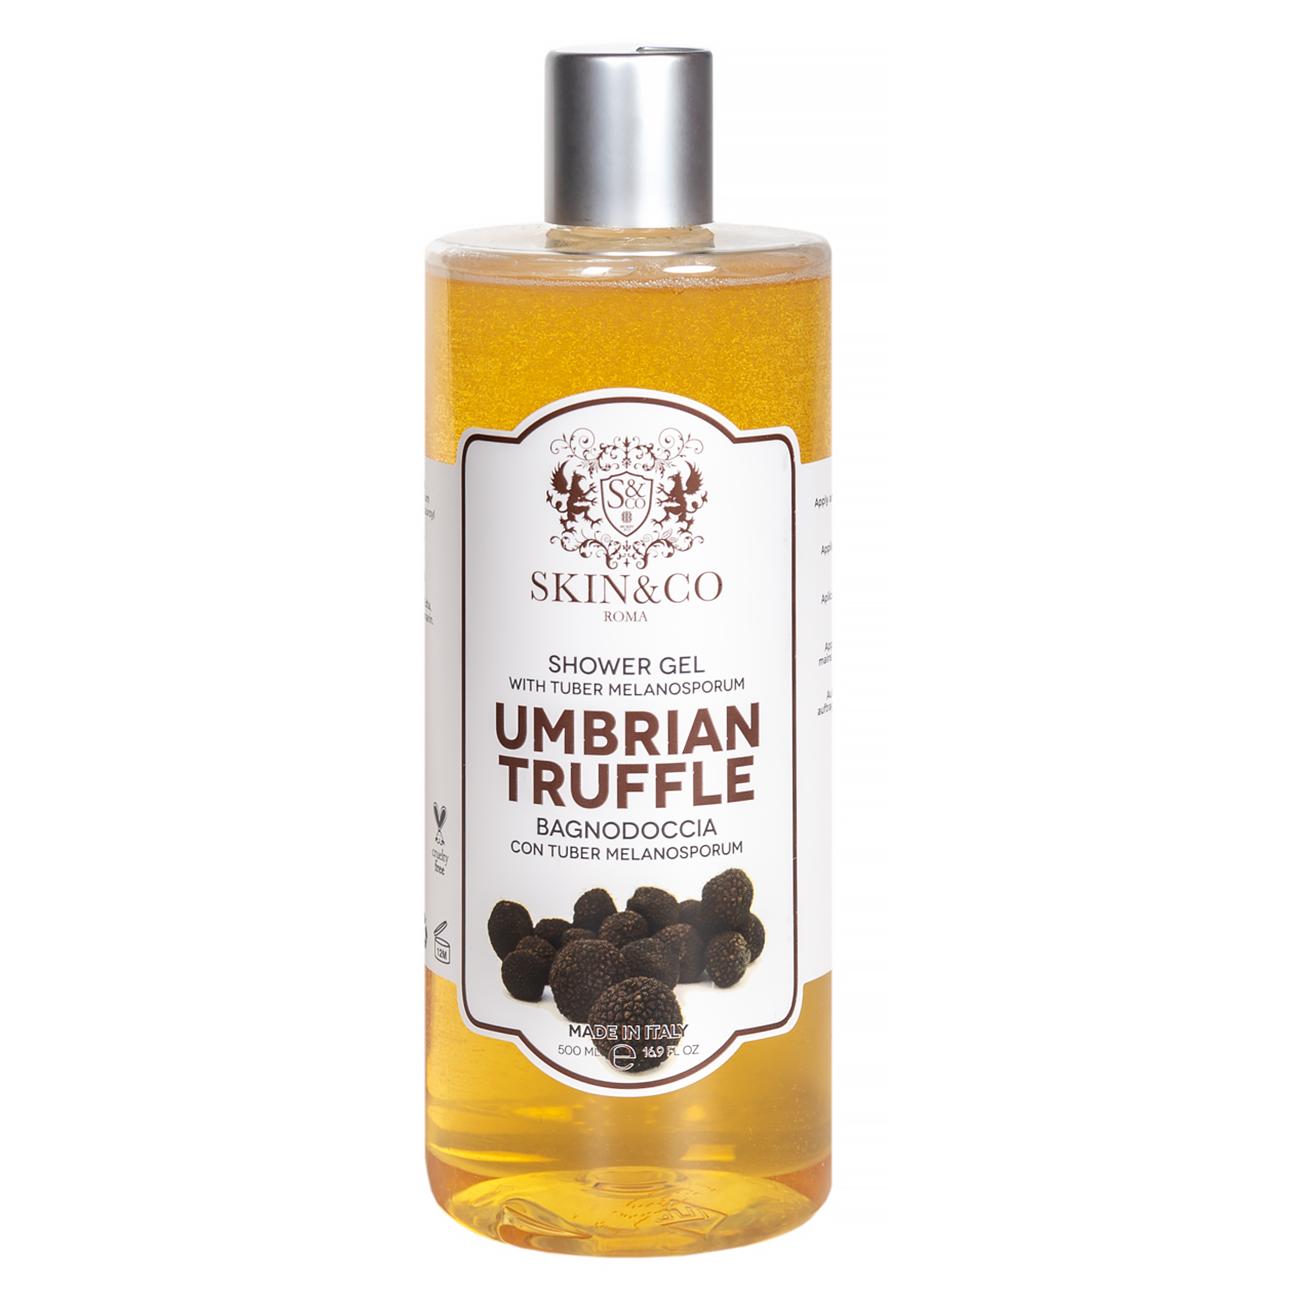 Umbrian Truffle Shower Gel 500ml Skin&Co Roma imagine 2021 bestvalue.eu